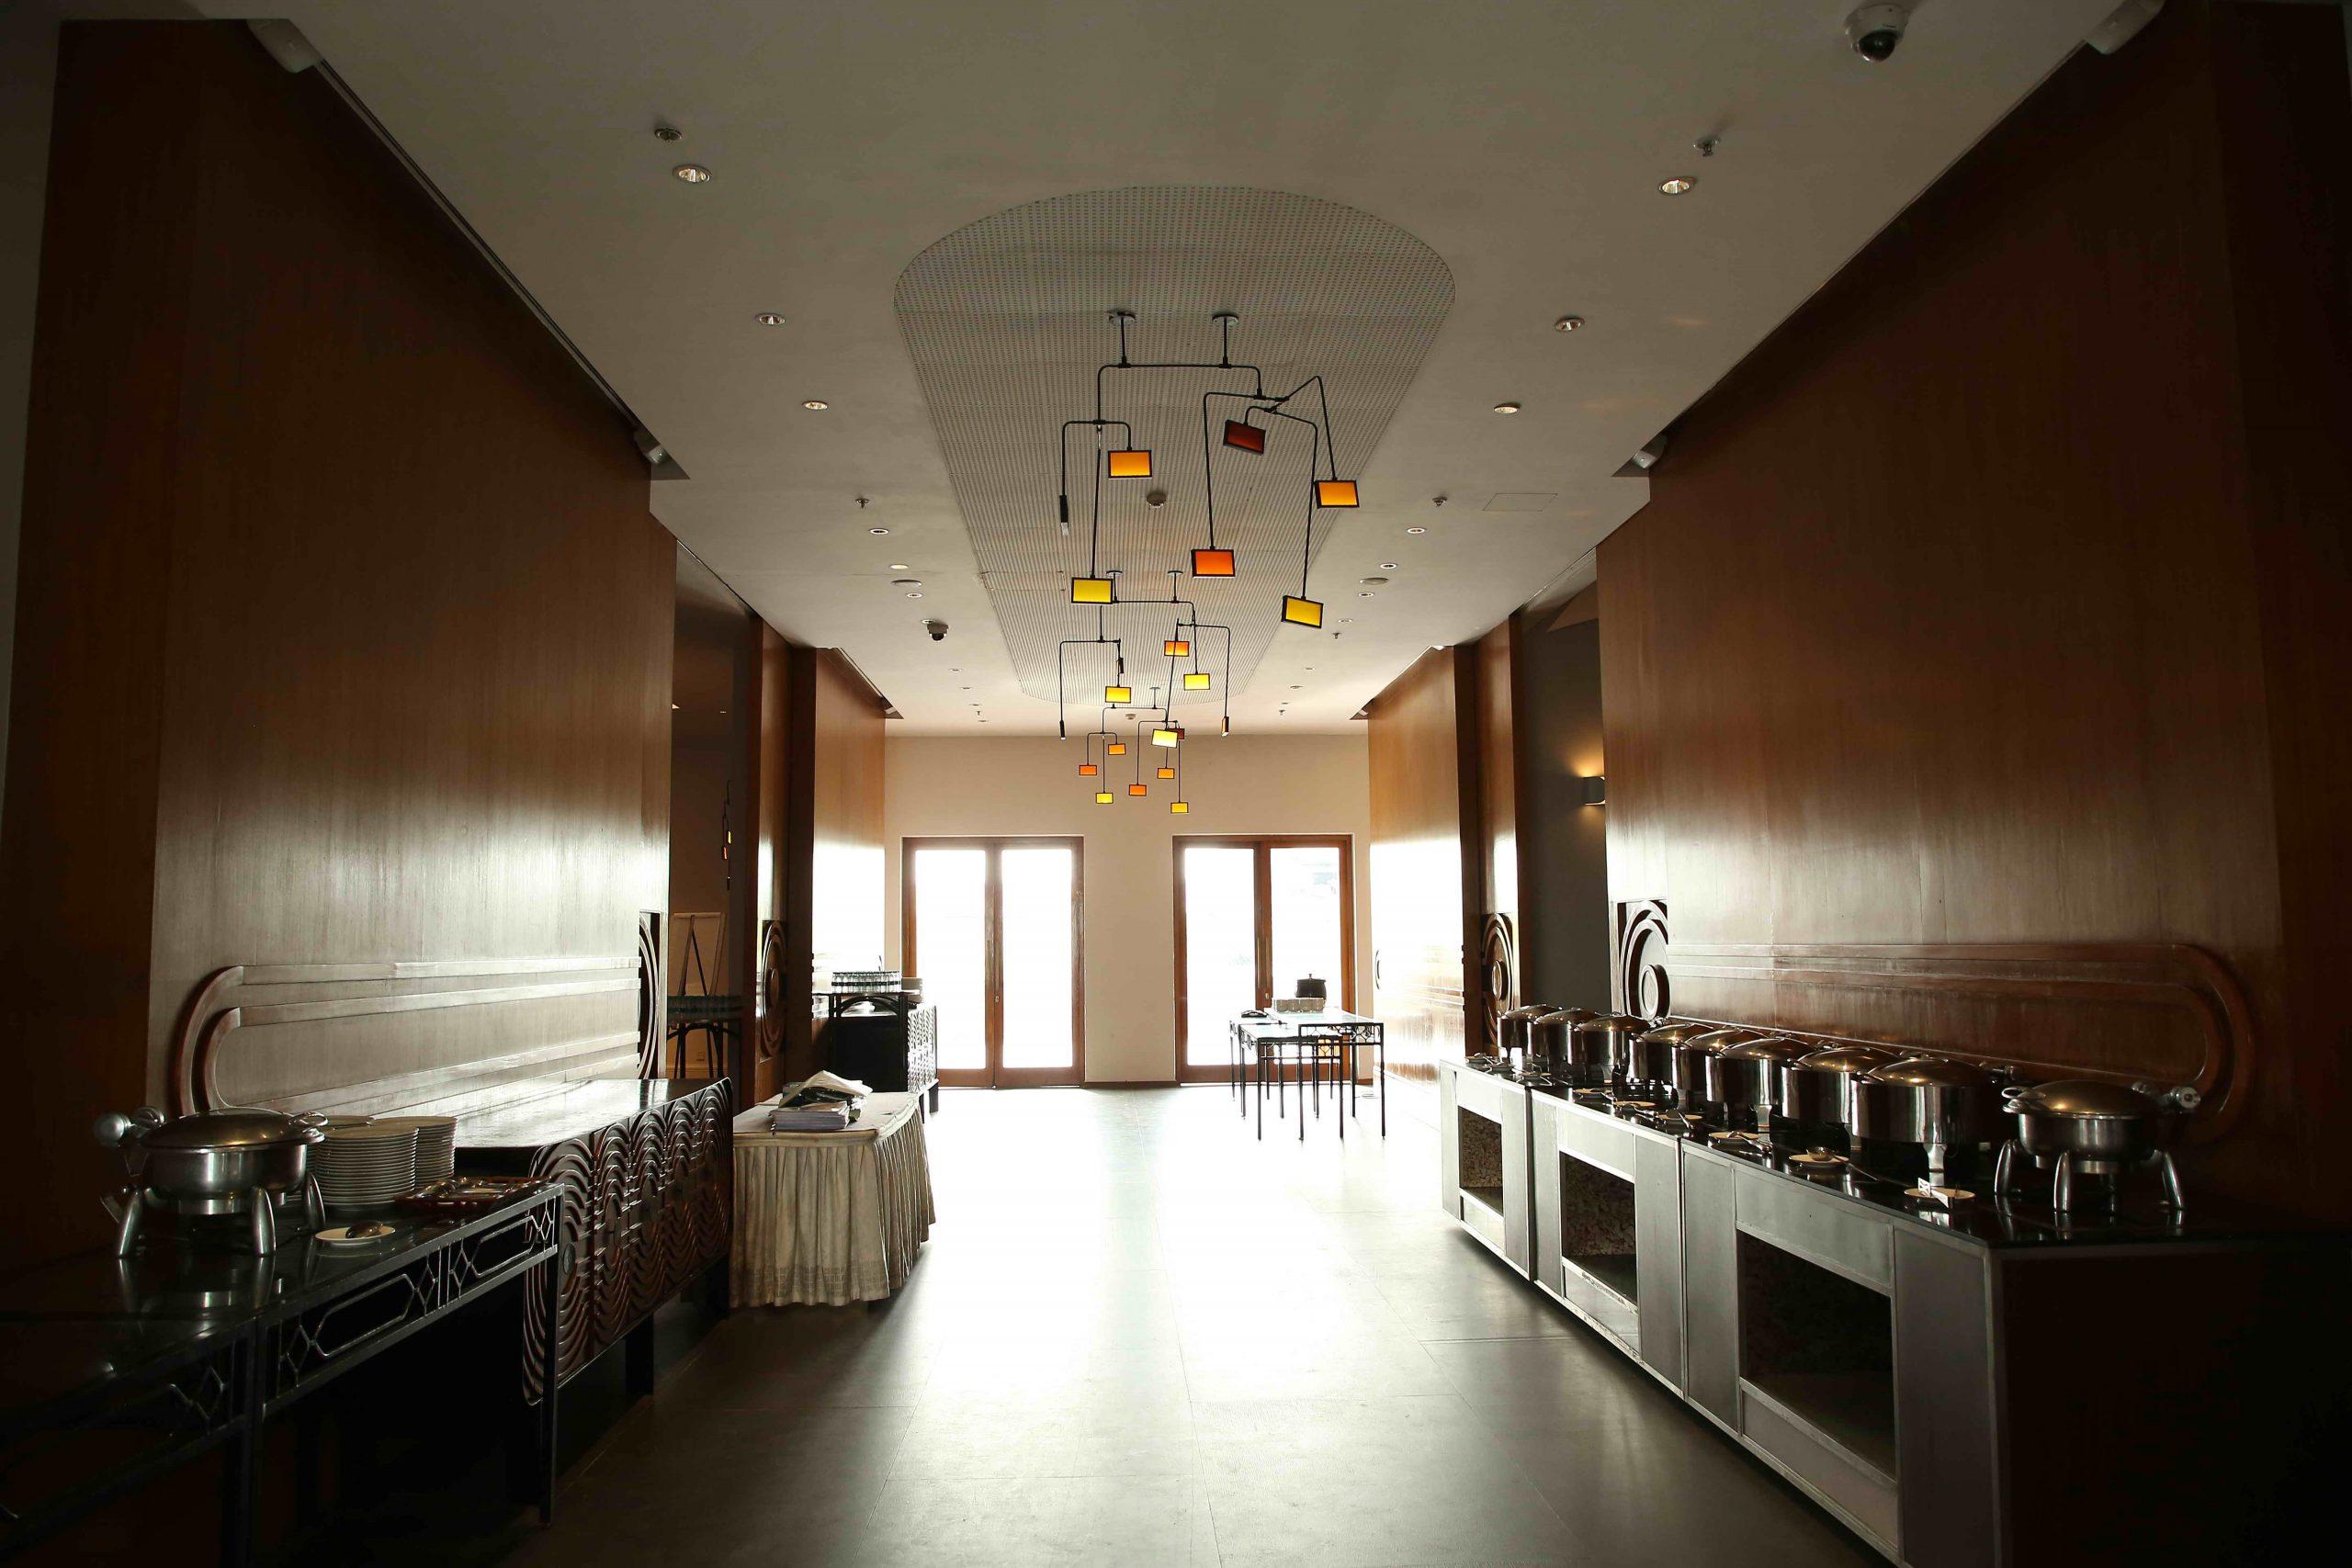 Interior of a Hotel